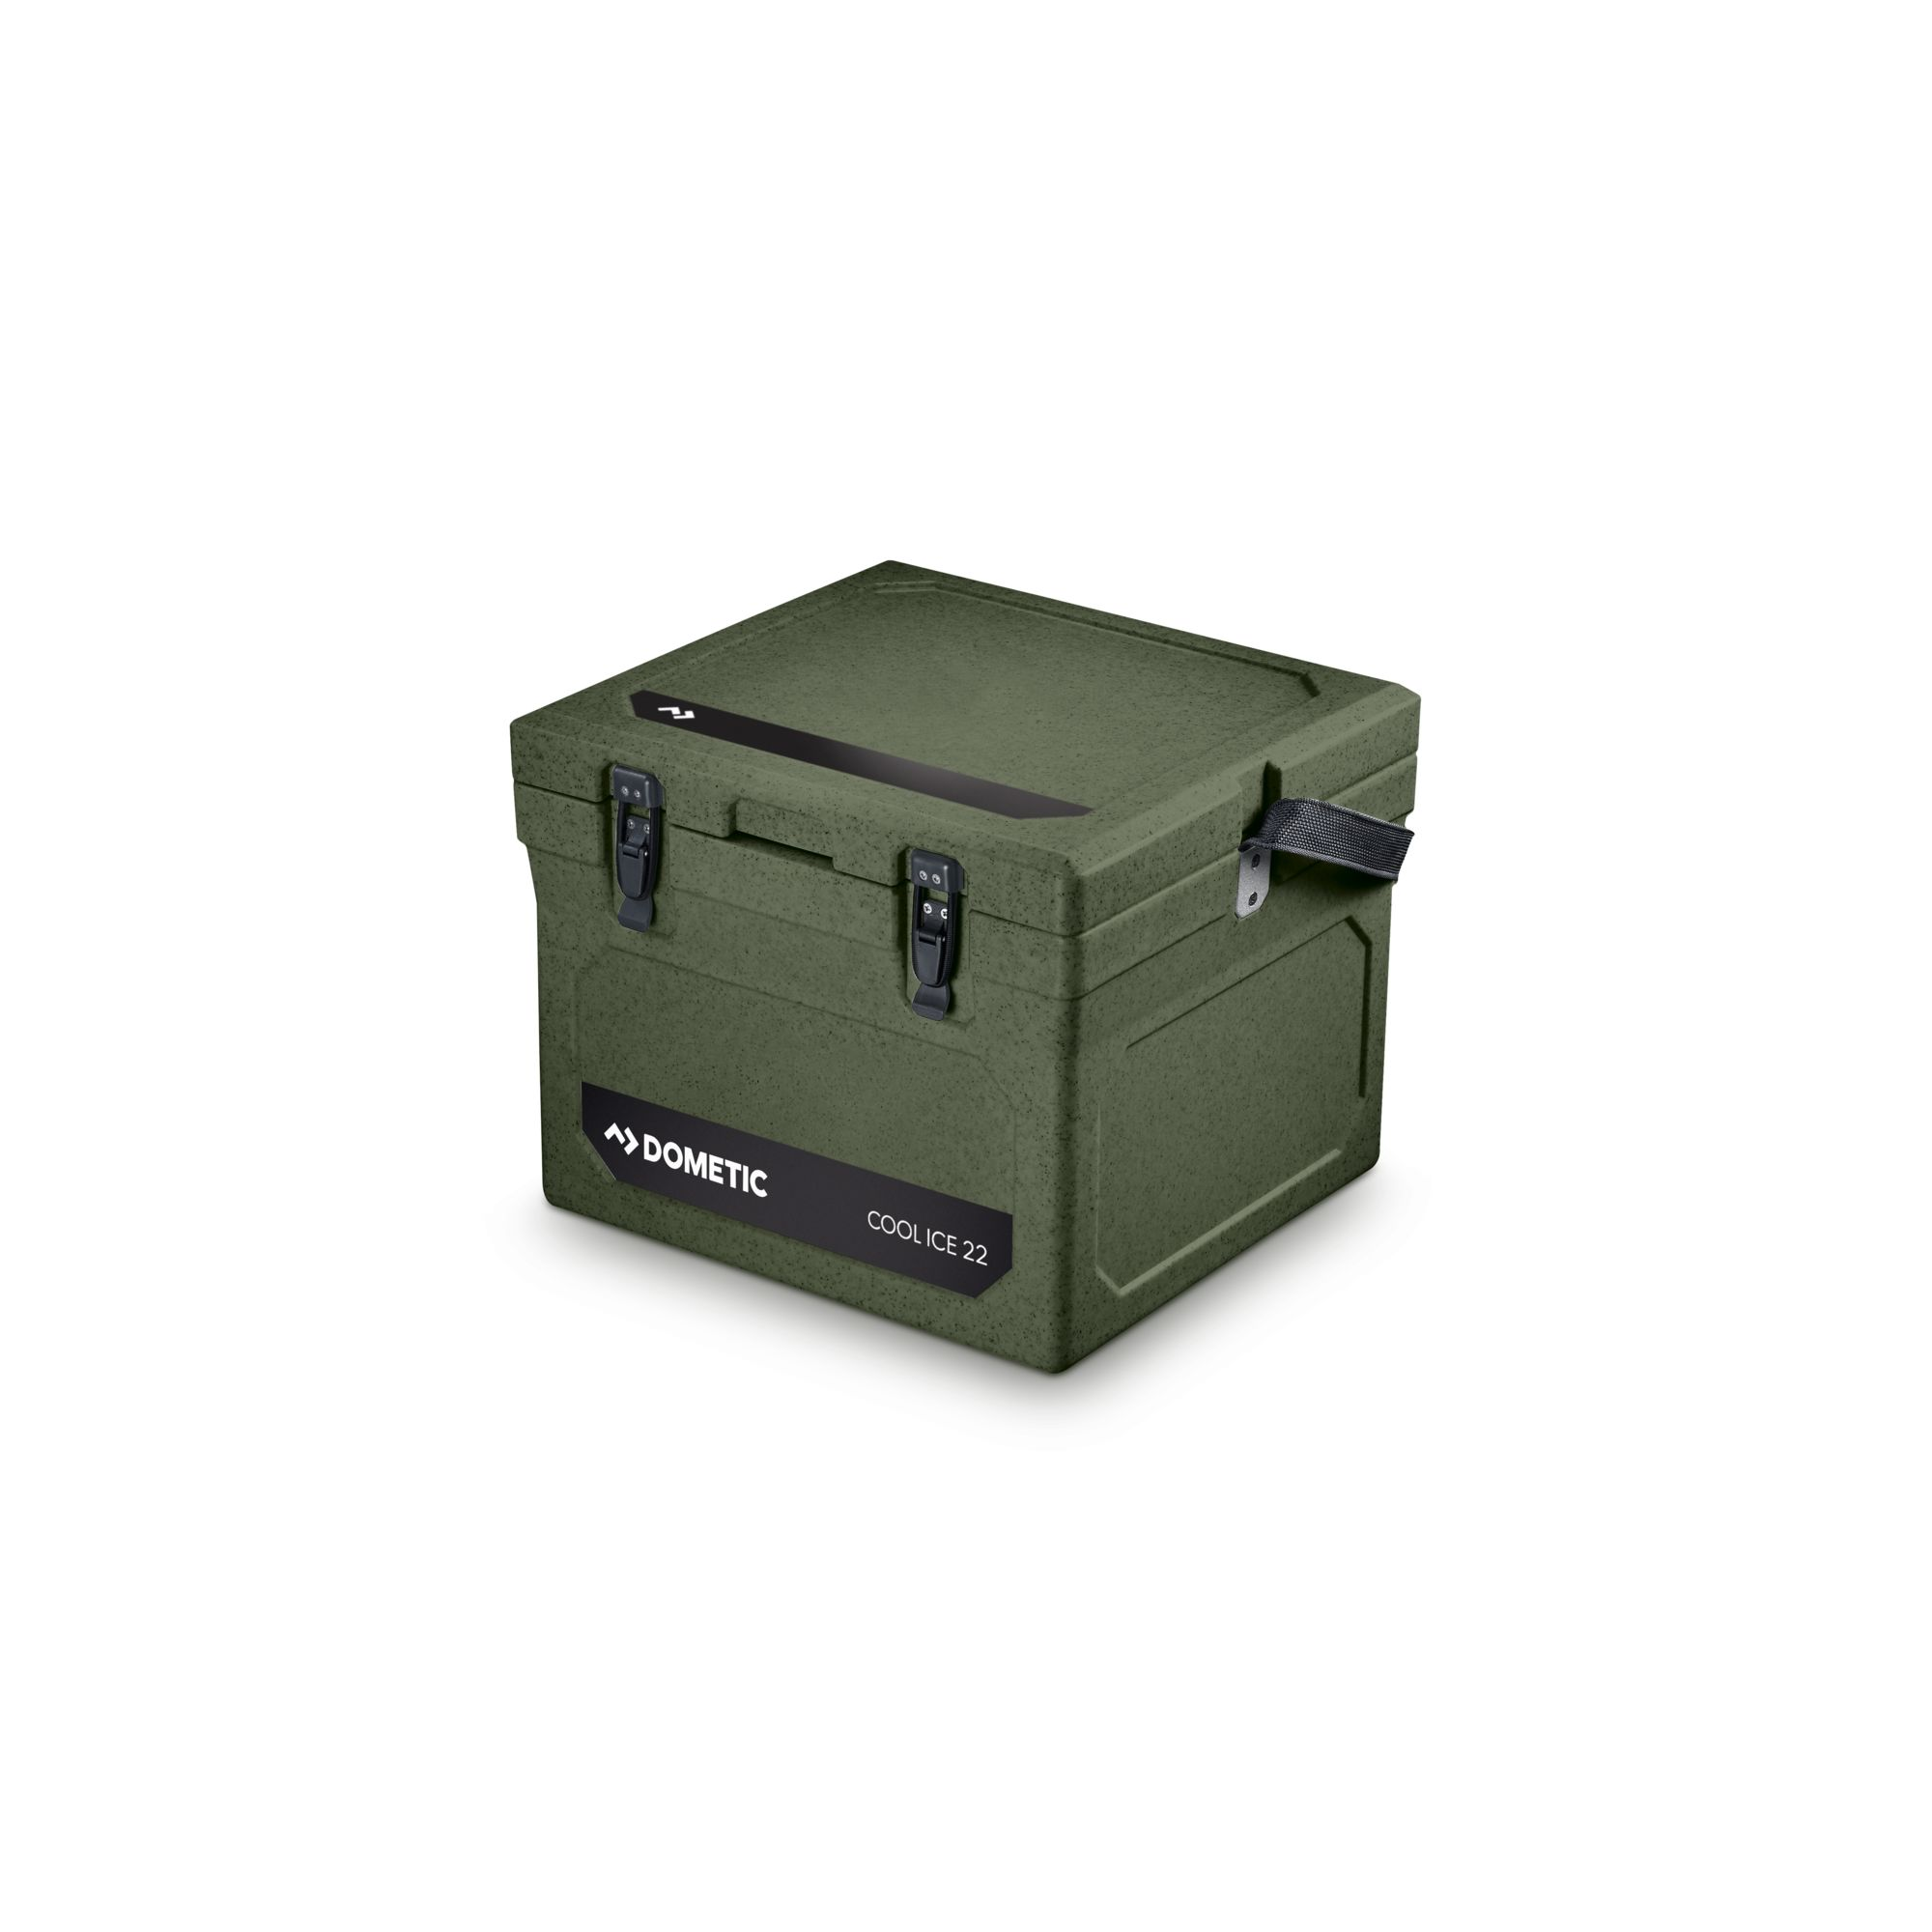 Dometic WCI 22 Kühlbox passiv Grün